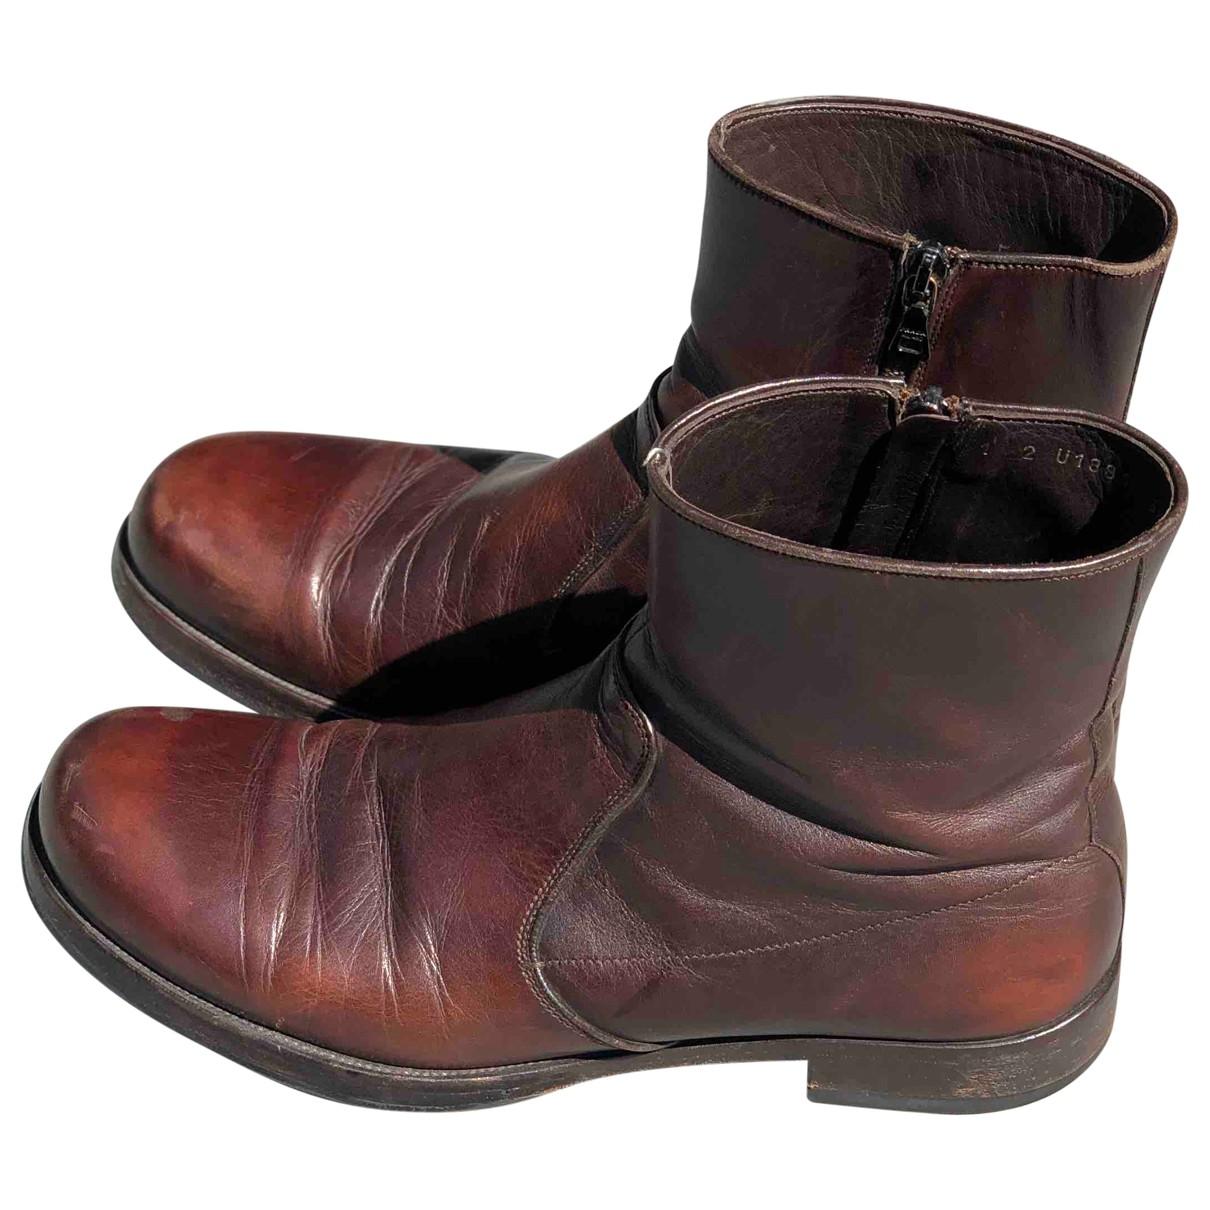 Prada \N Burgundy Leather Boots for Men 40 EU